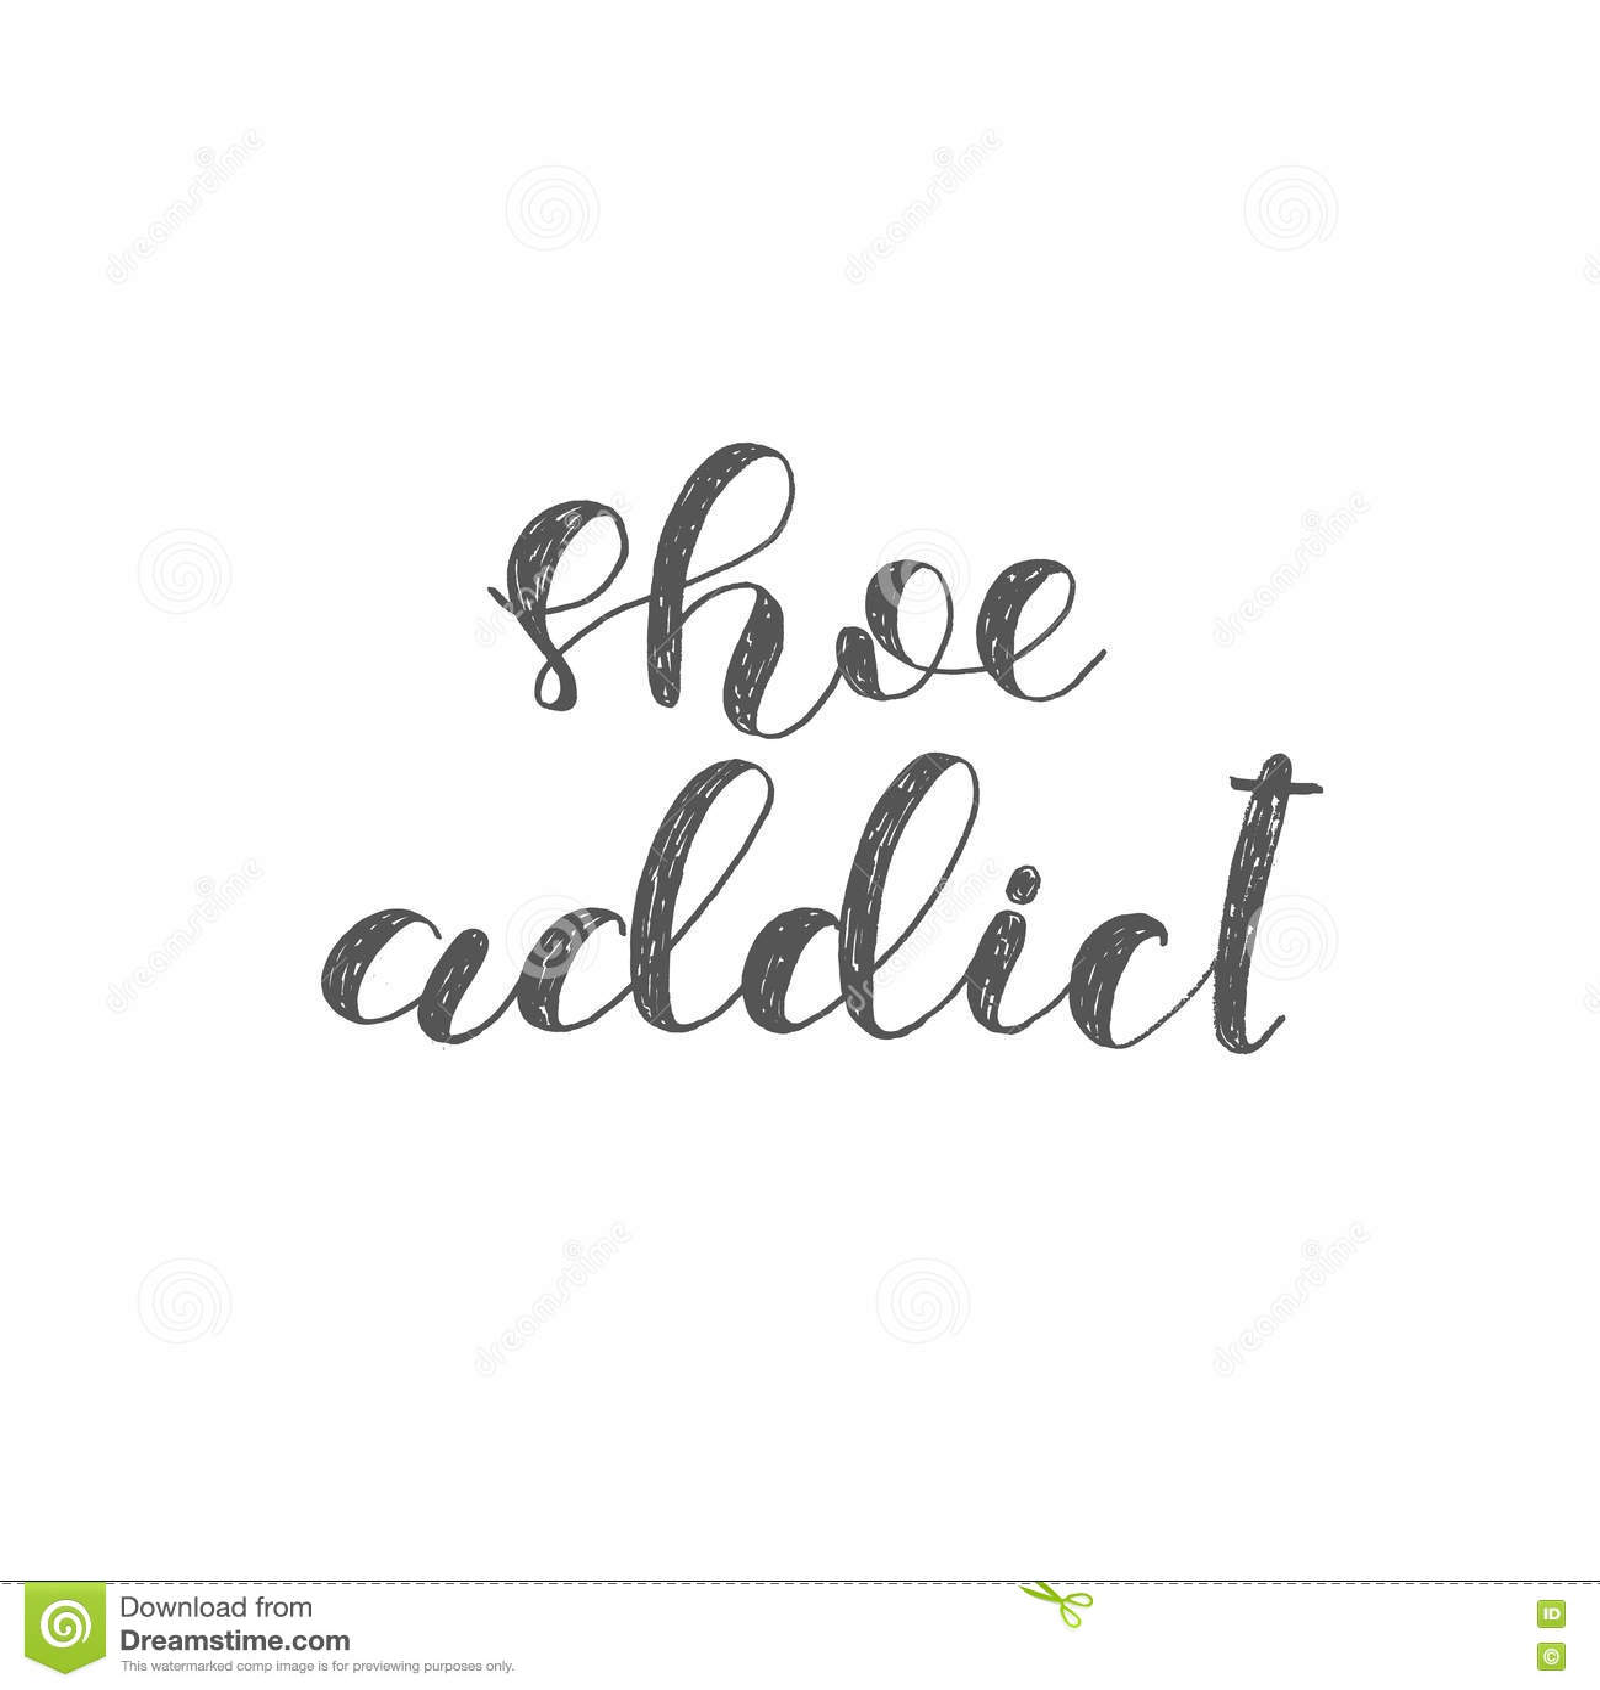 Download Shoe Addict Brush Lettering Stock Illustration